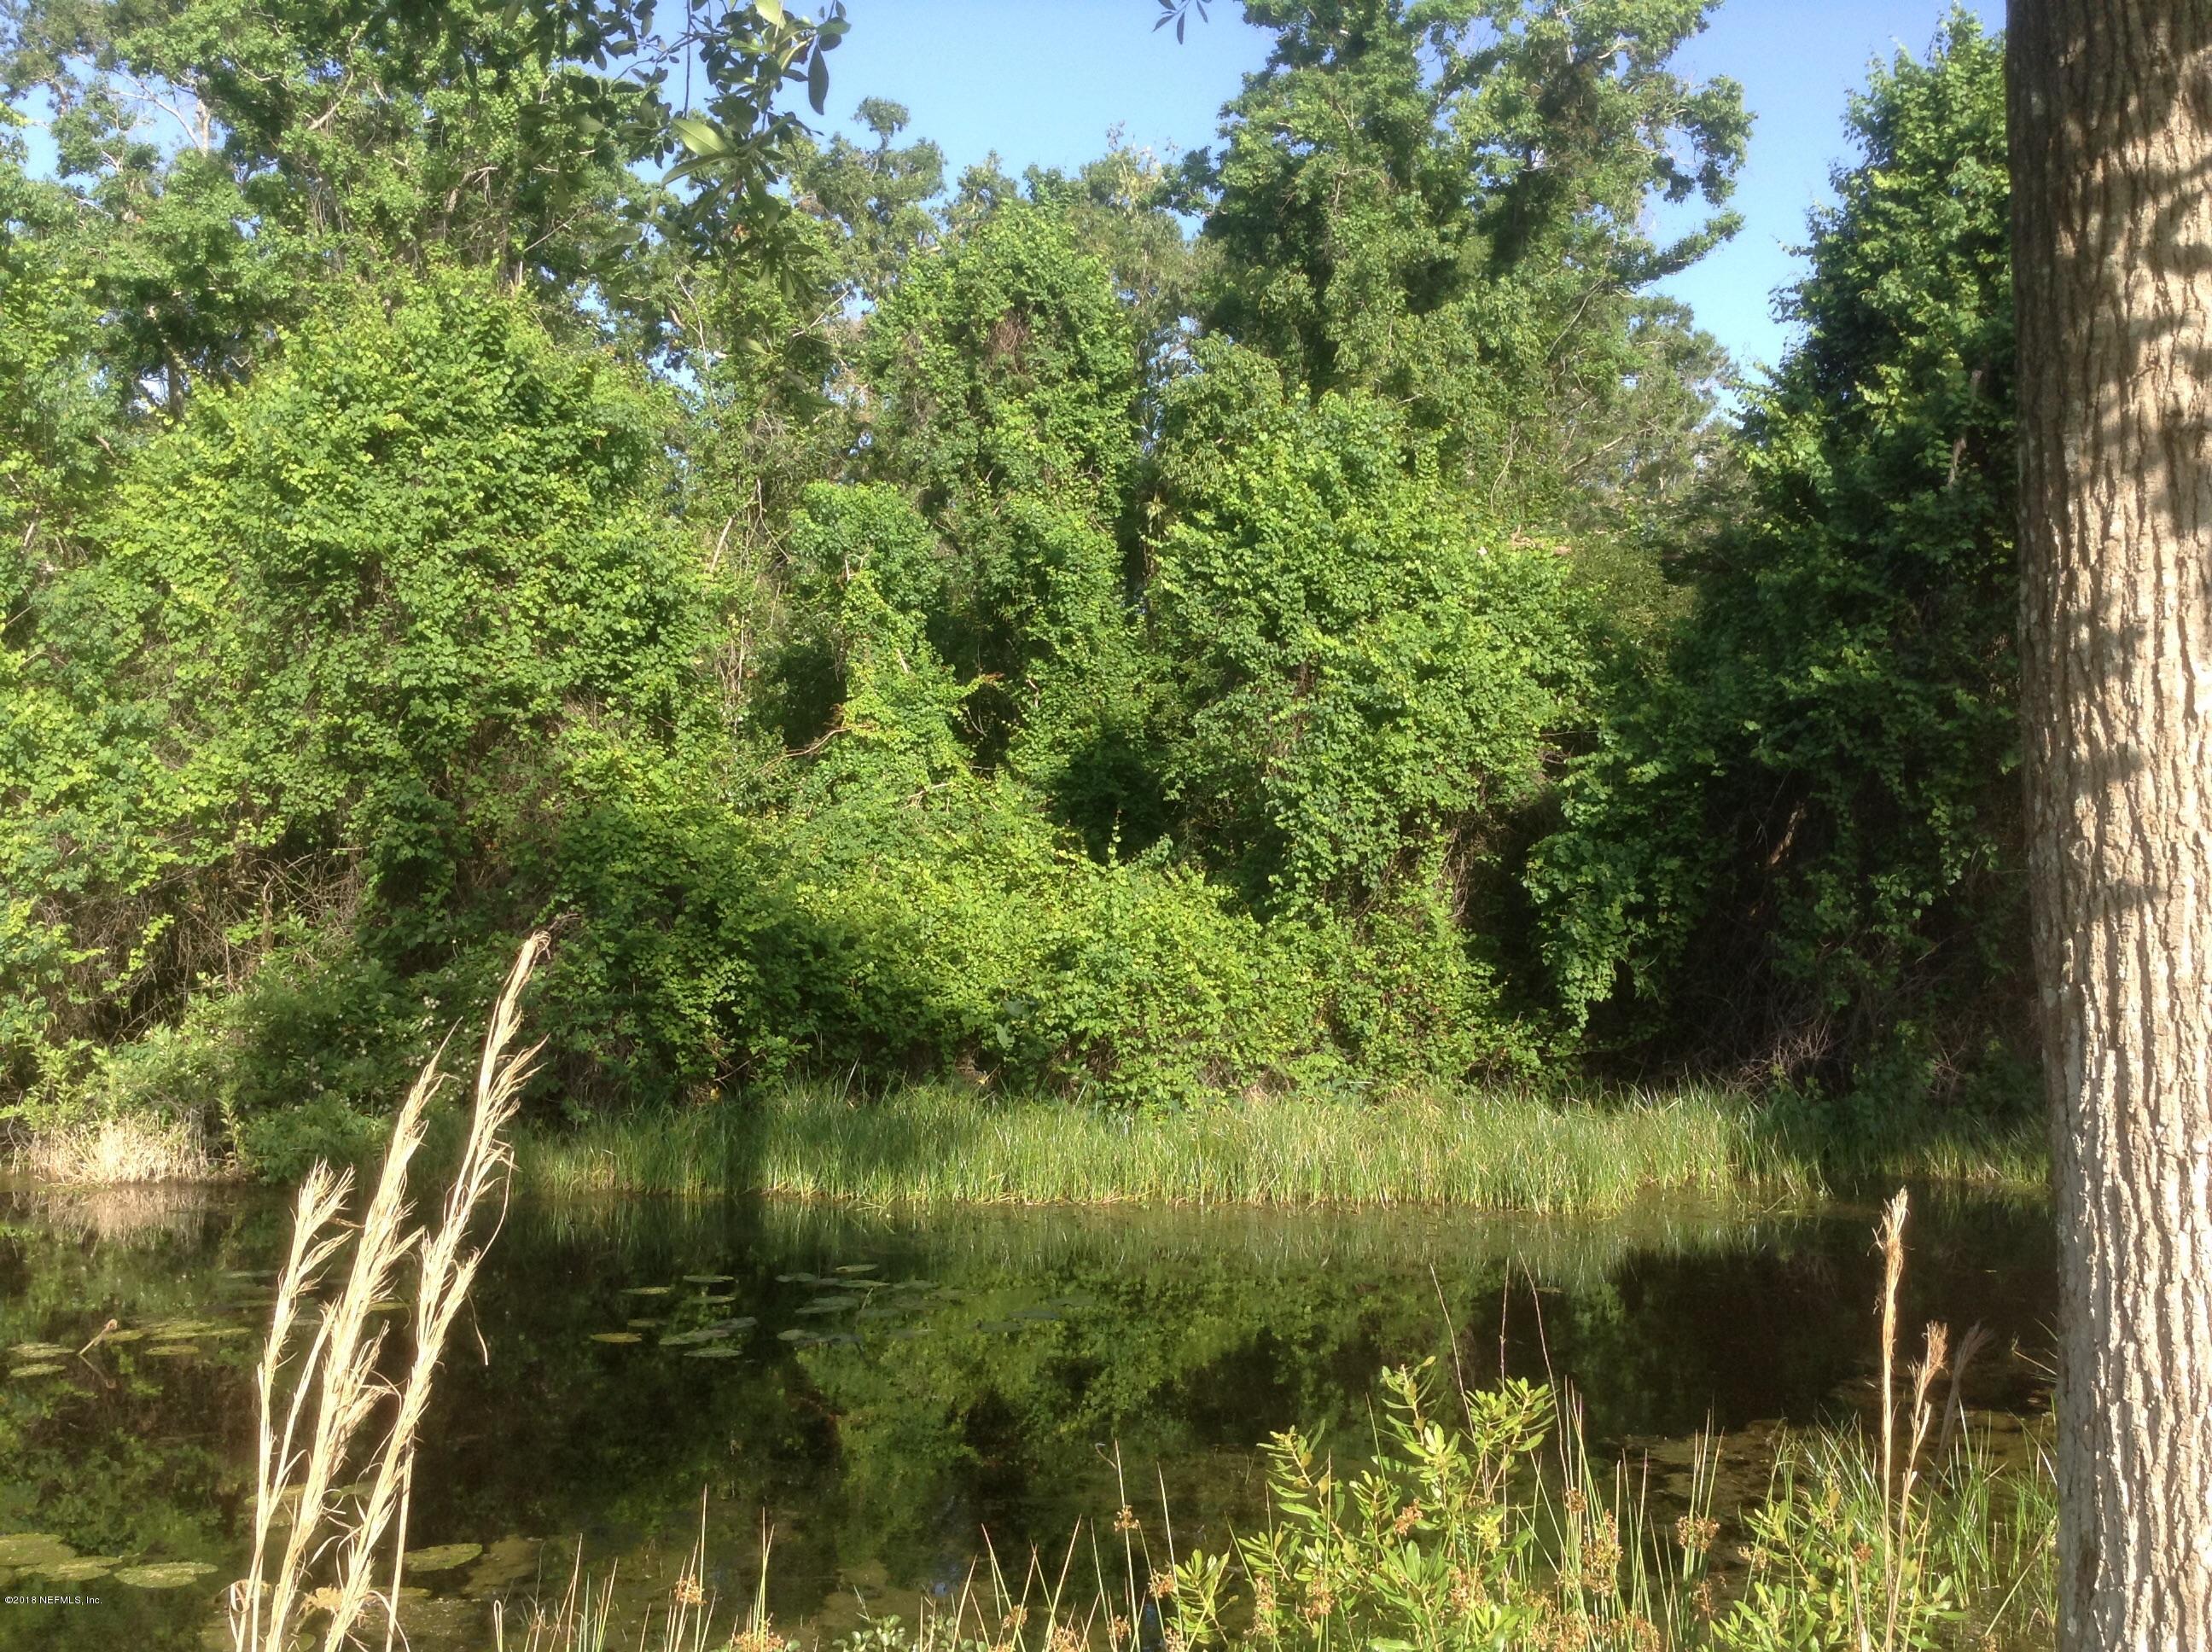 104 LAKE IDA POINT, INTERLACHEN, FLORIDA 32148, ,Vacant land,For sale,LAKE IDA POINT,938172